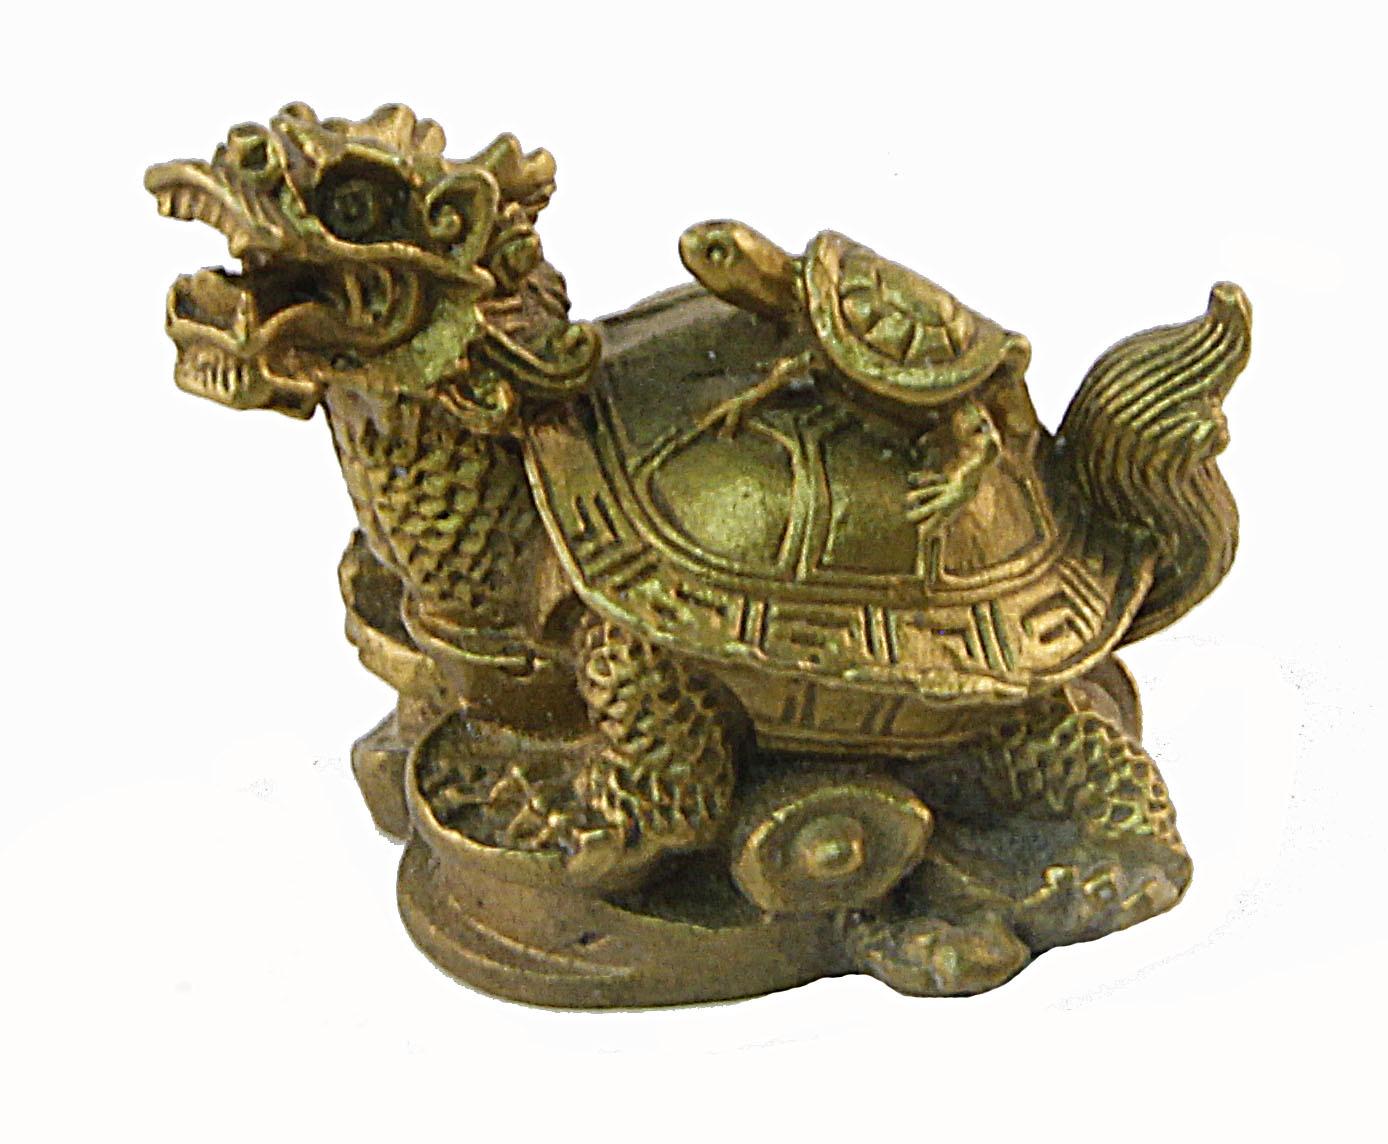 Статуэтка Драконочерепаха. Бронза, прочеканка. Китай. вторая половина XX века